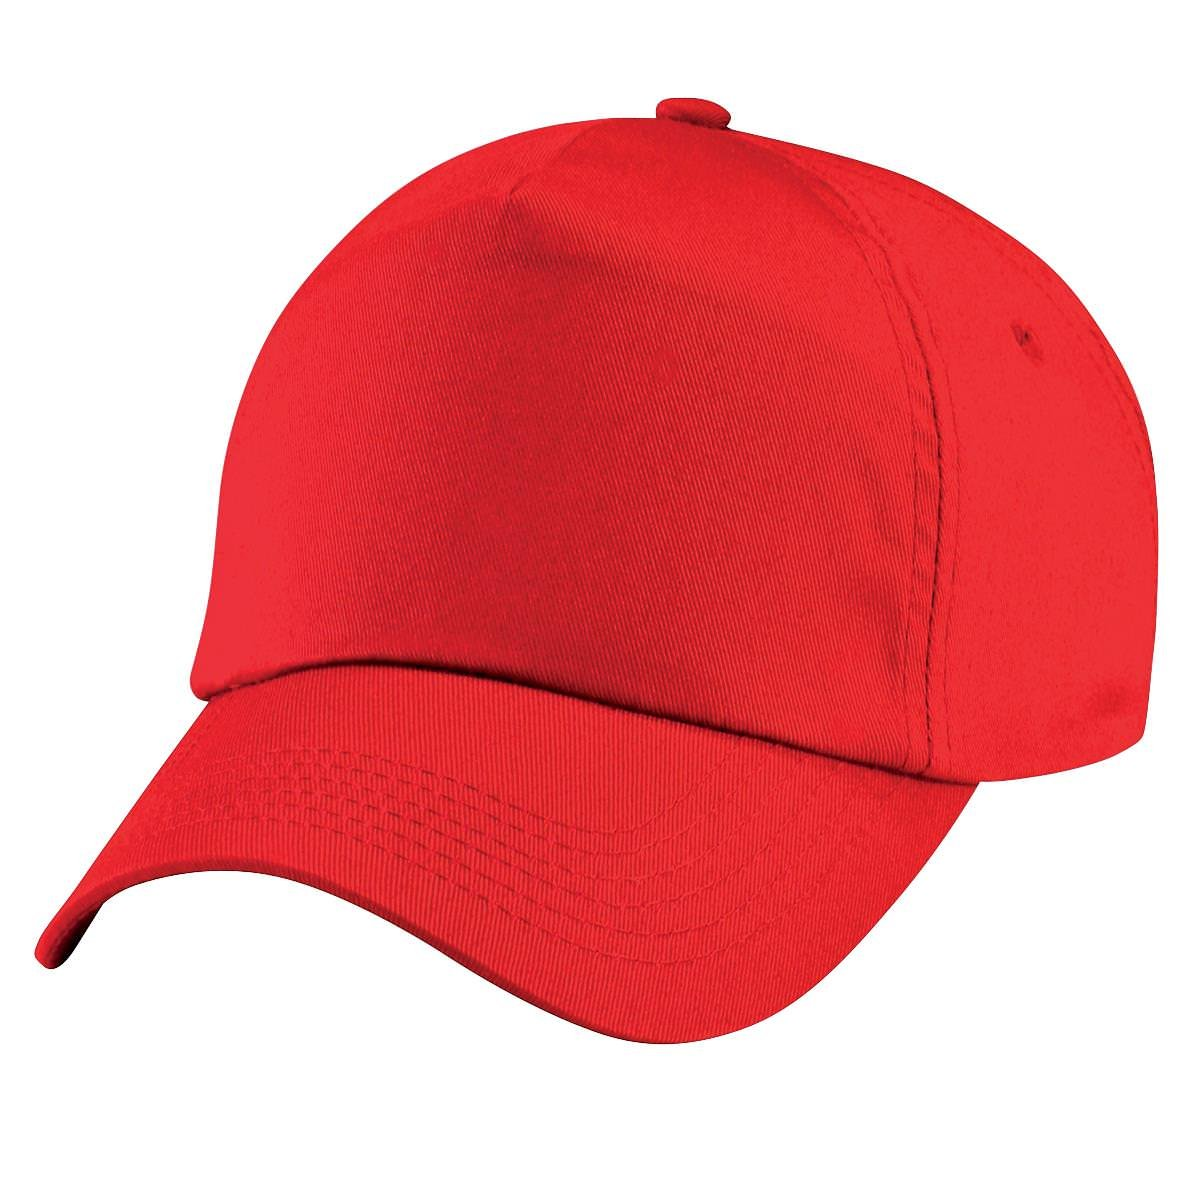 Cap Grupo 5 Beechfield junior original - Bright Red